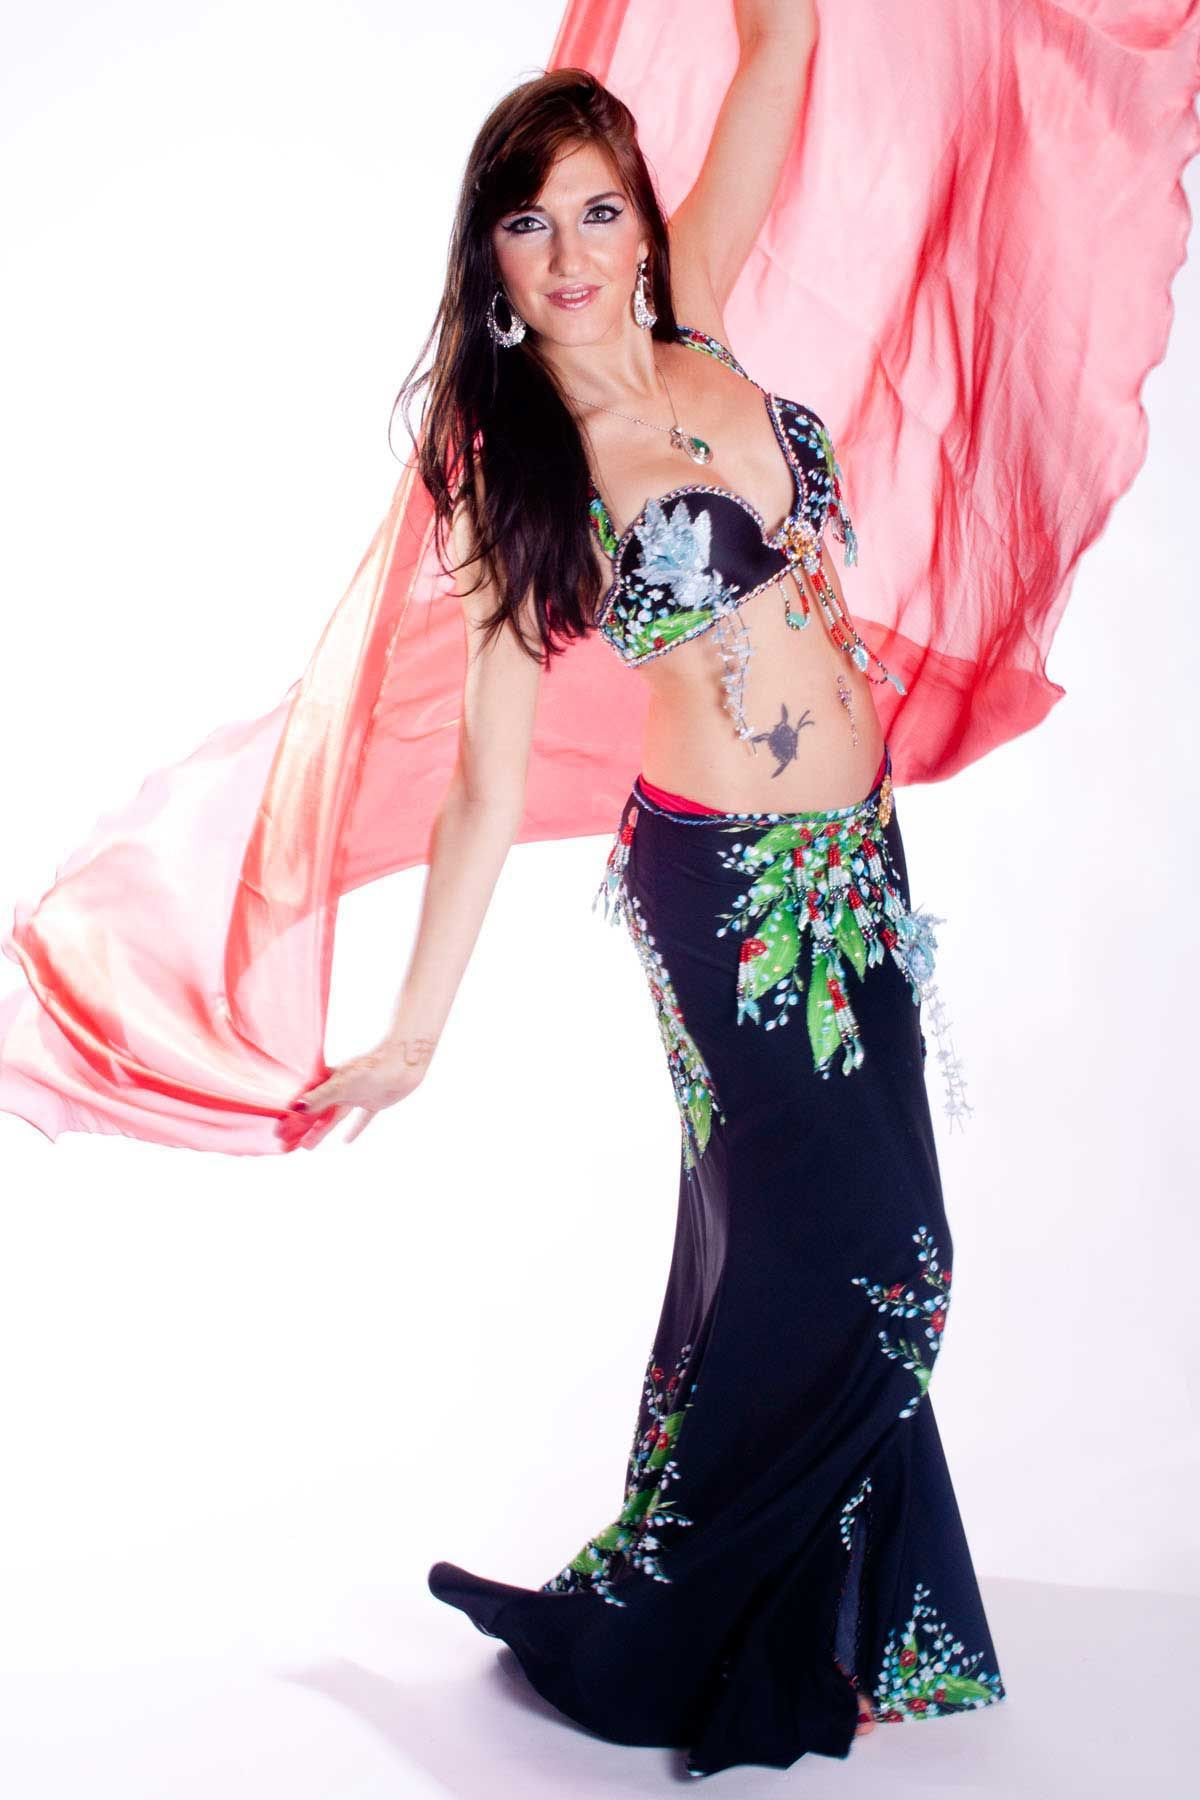 Belly dance cabaret costume - True Elegance | My style ...